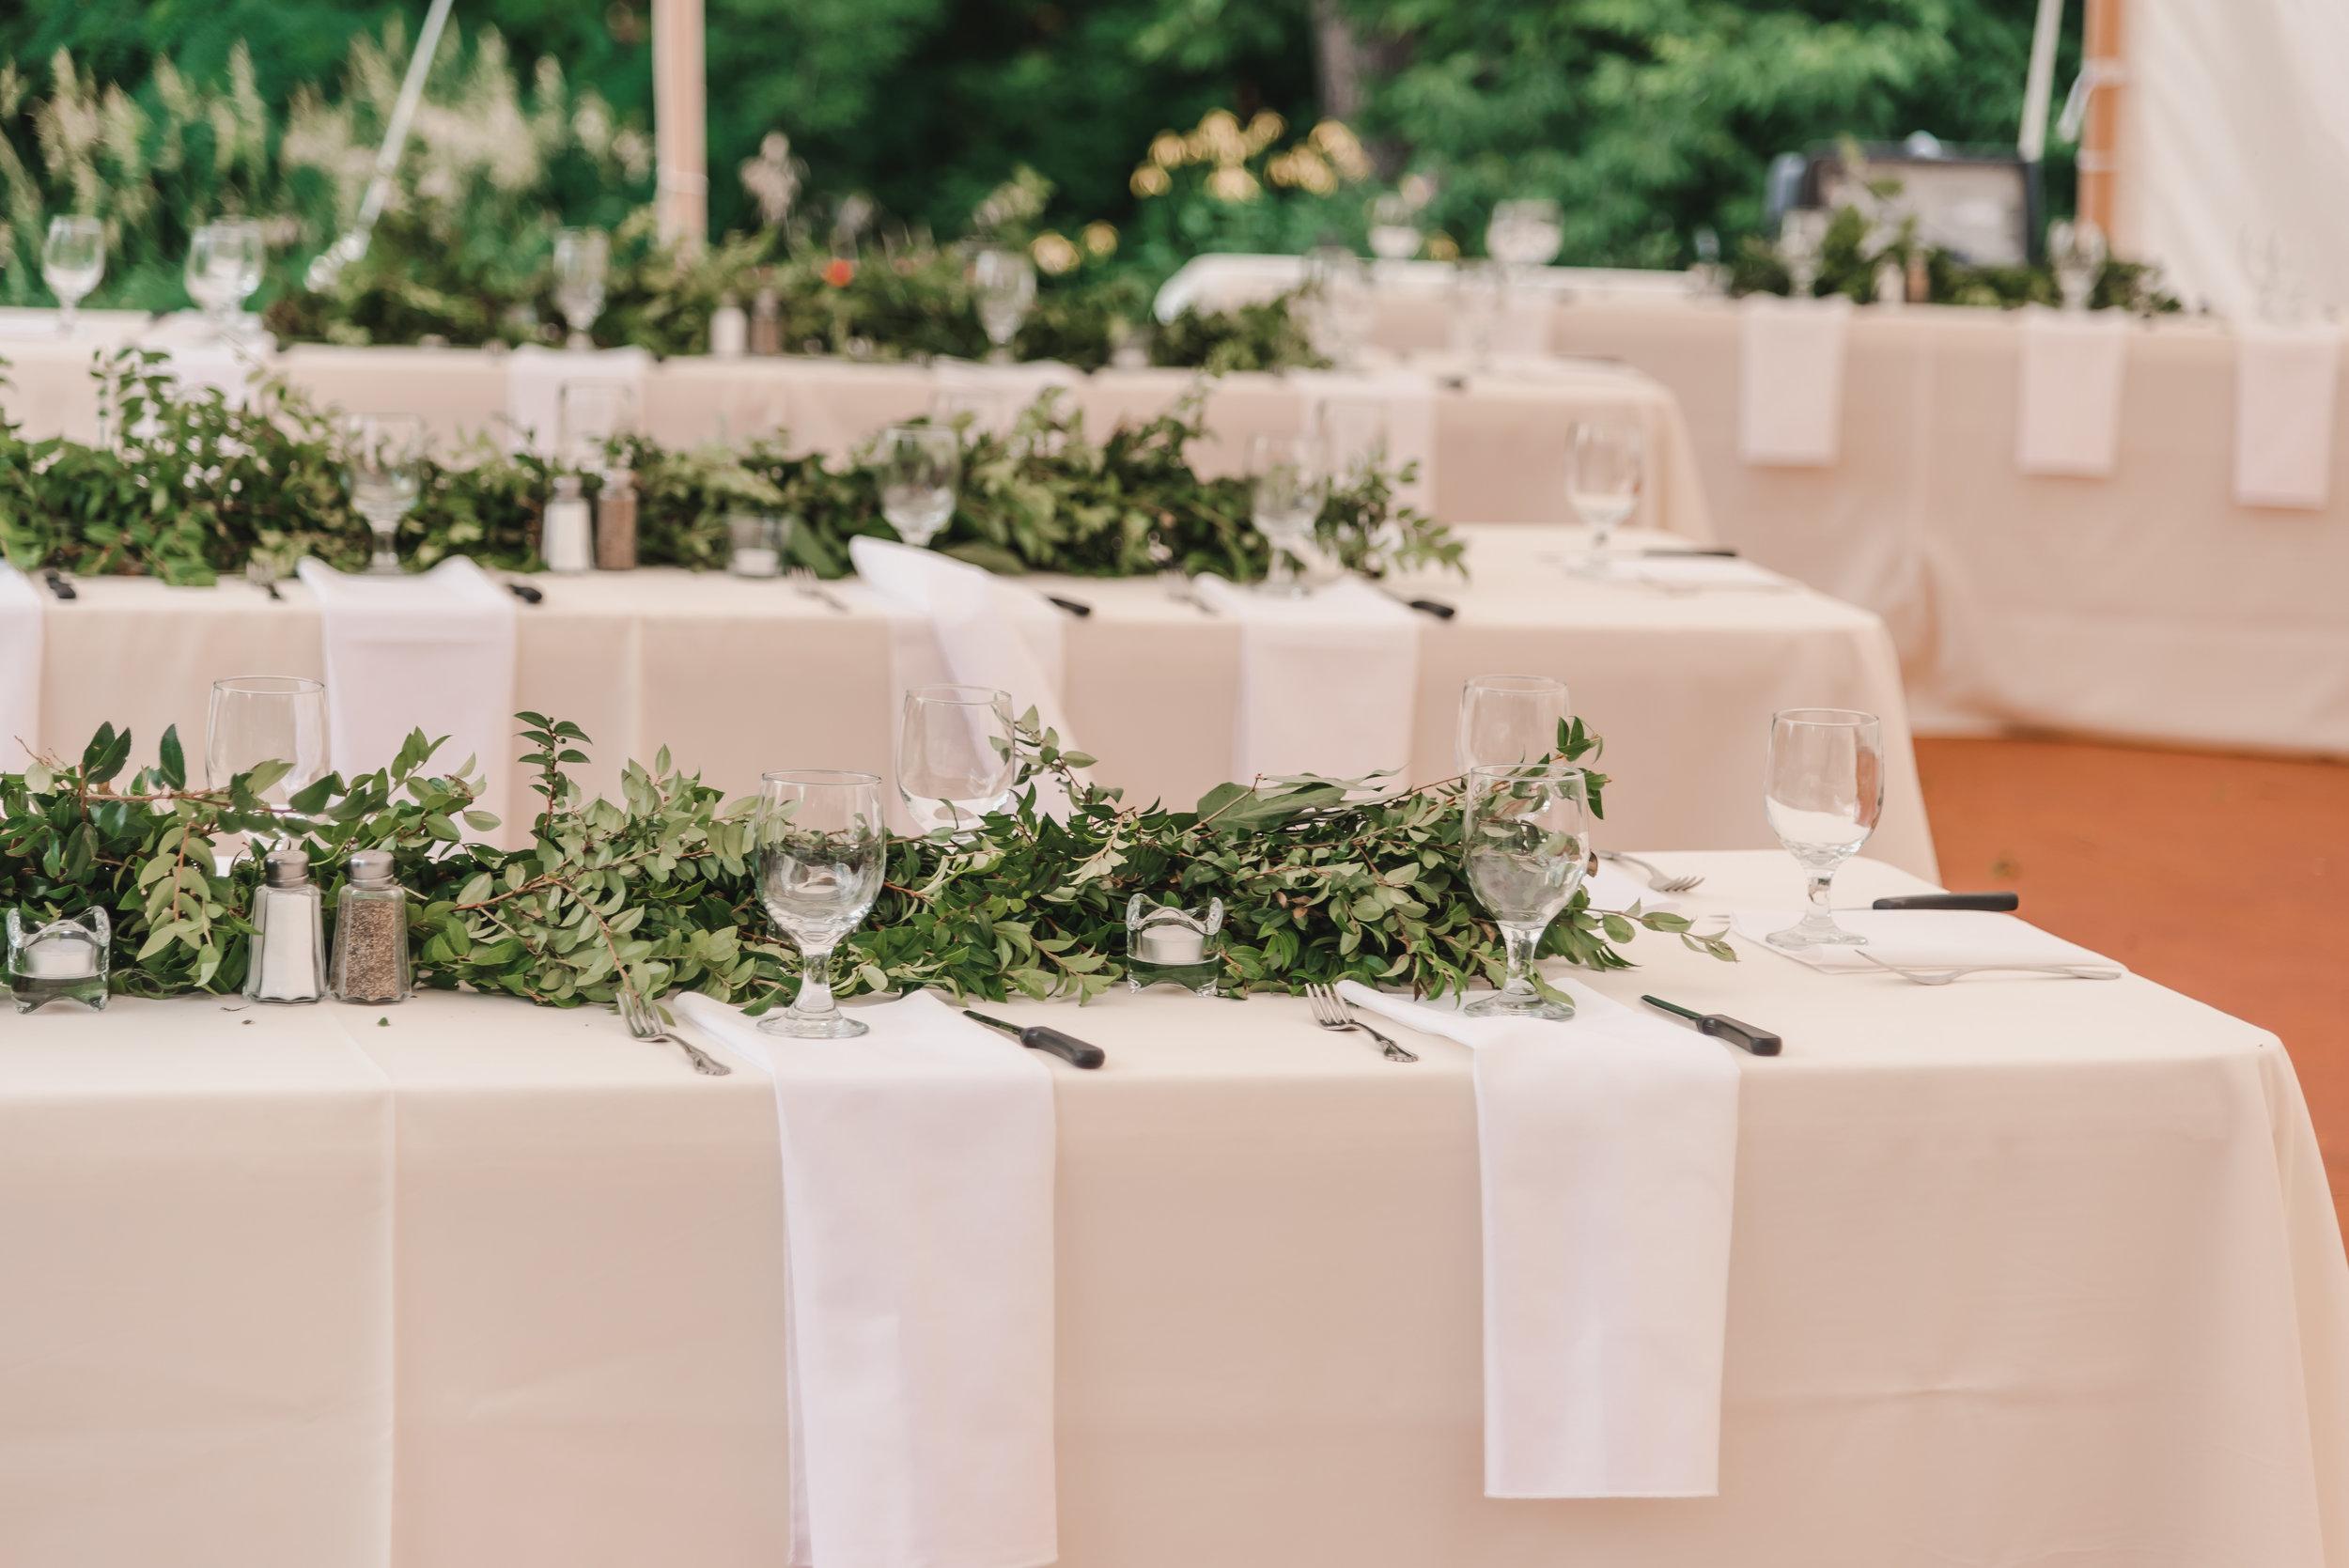 Fresh, lush green table garlands at wedding reception